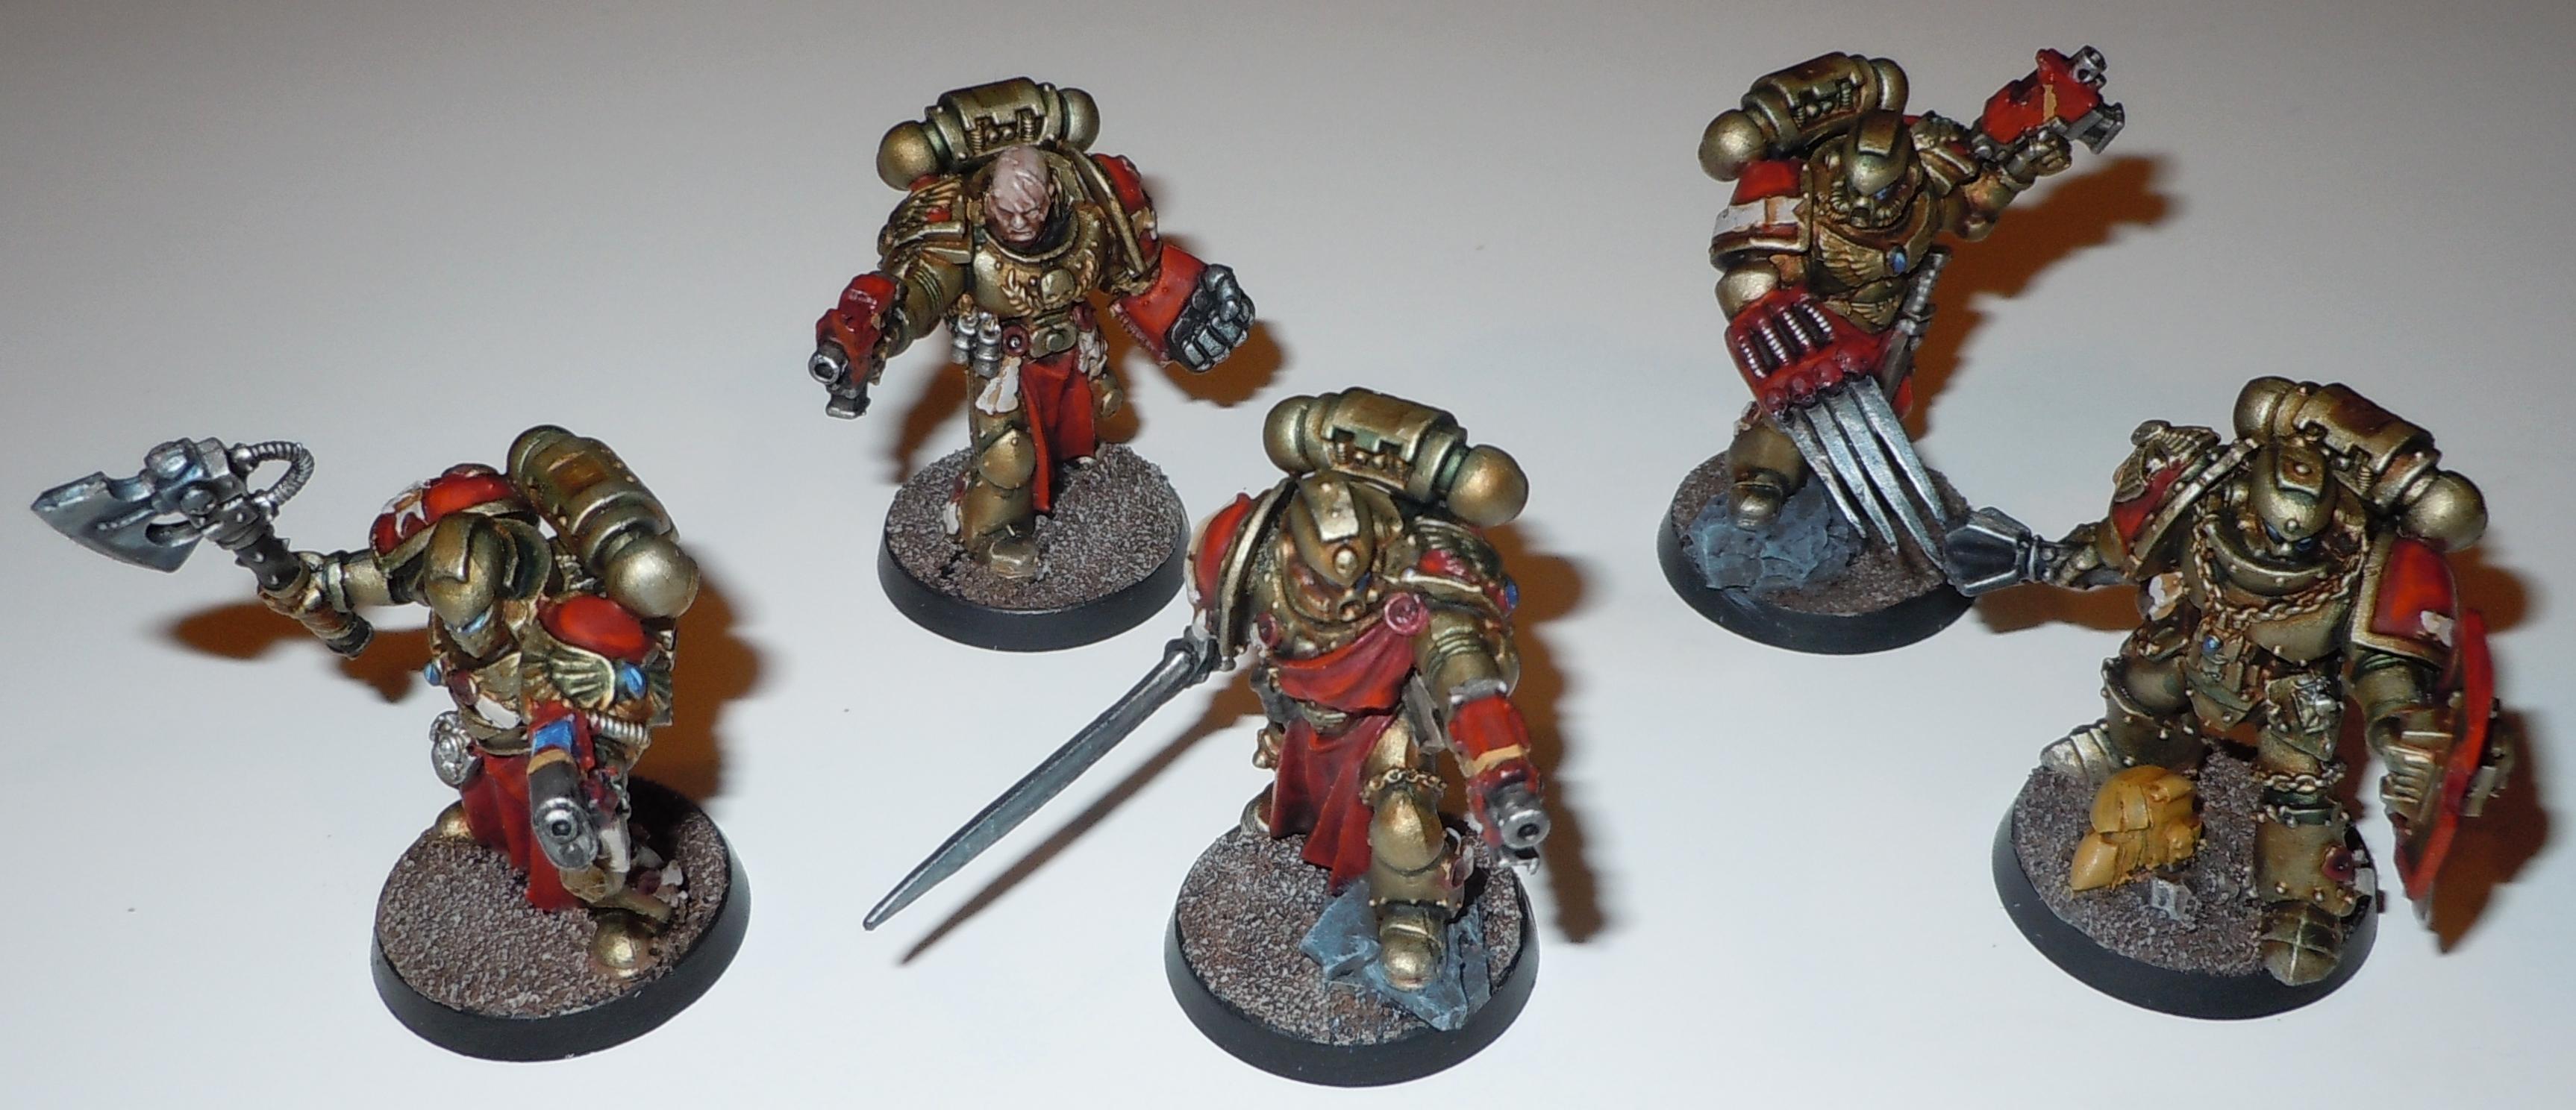 Badab War, Minotaurs, Space Marines, Vanguard, Veteran